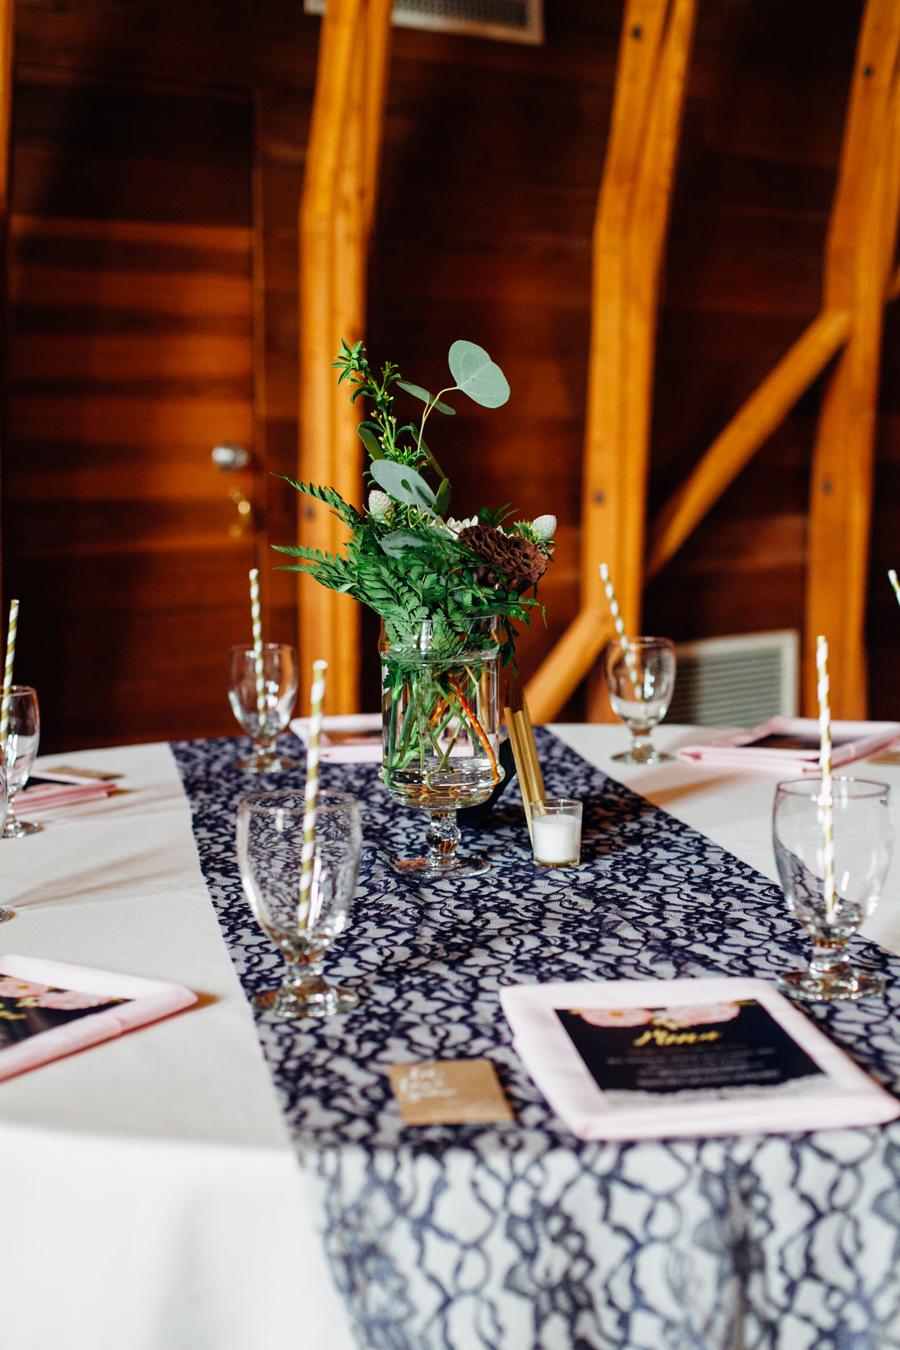 019-seattle-bothell-wedding-photographer-russells-restaurant-wilkins-photo.jpg